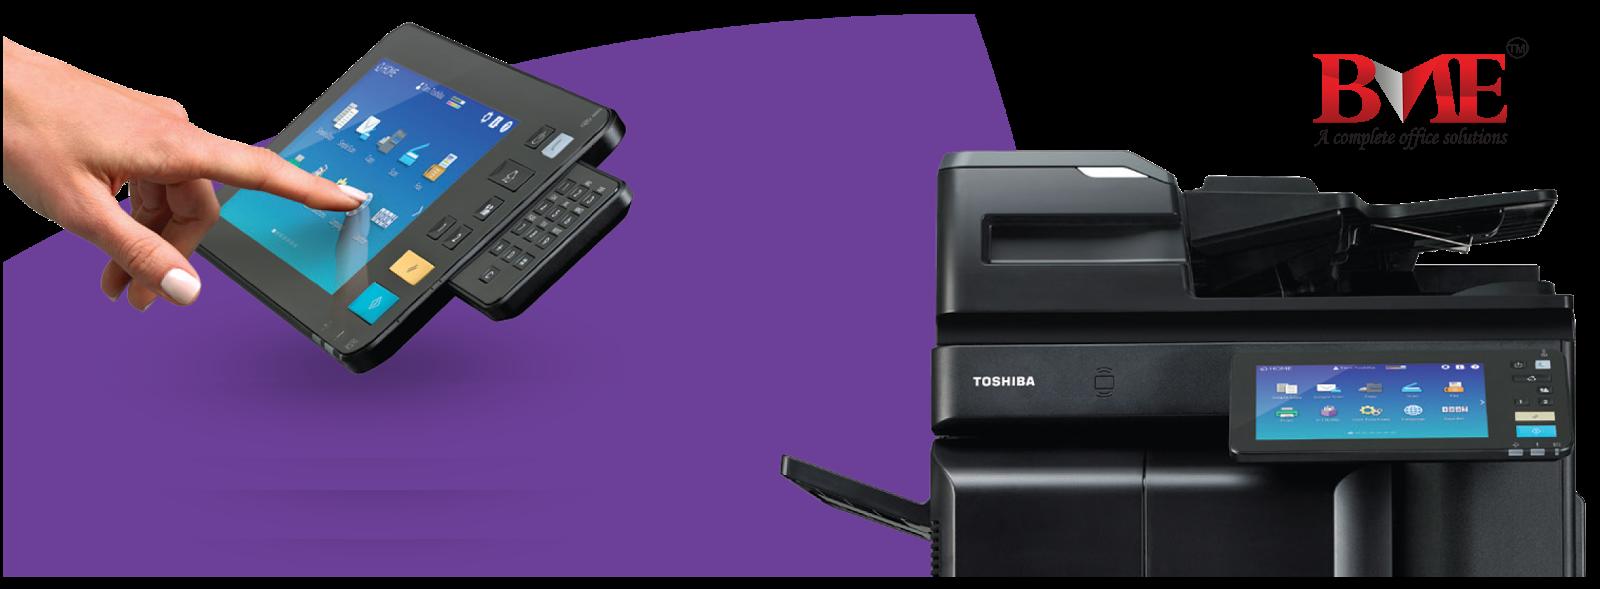 TOSHIBA E STUDIO2505AC 3005AC 3505AC 4505AC 5005AC Series Digital Color Copier Machines A3 Multifunction System 50 Ppm